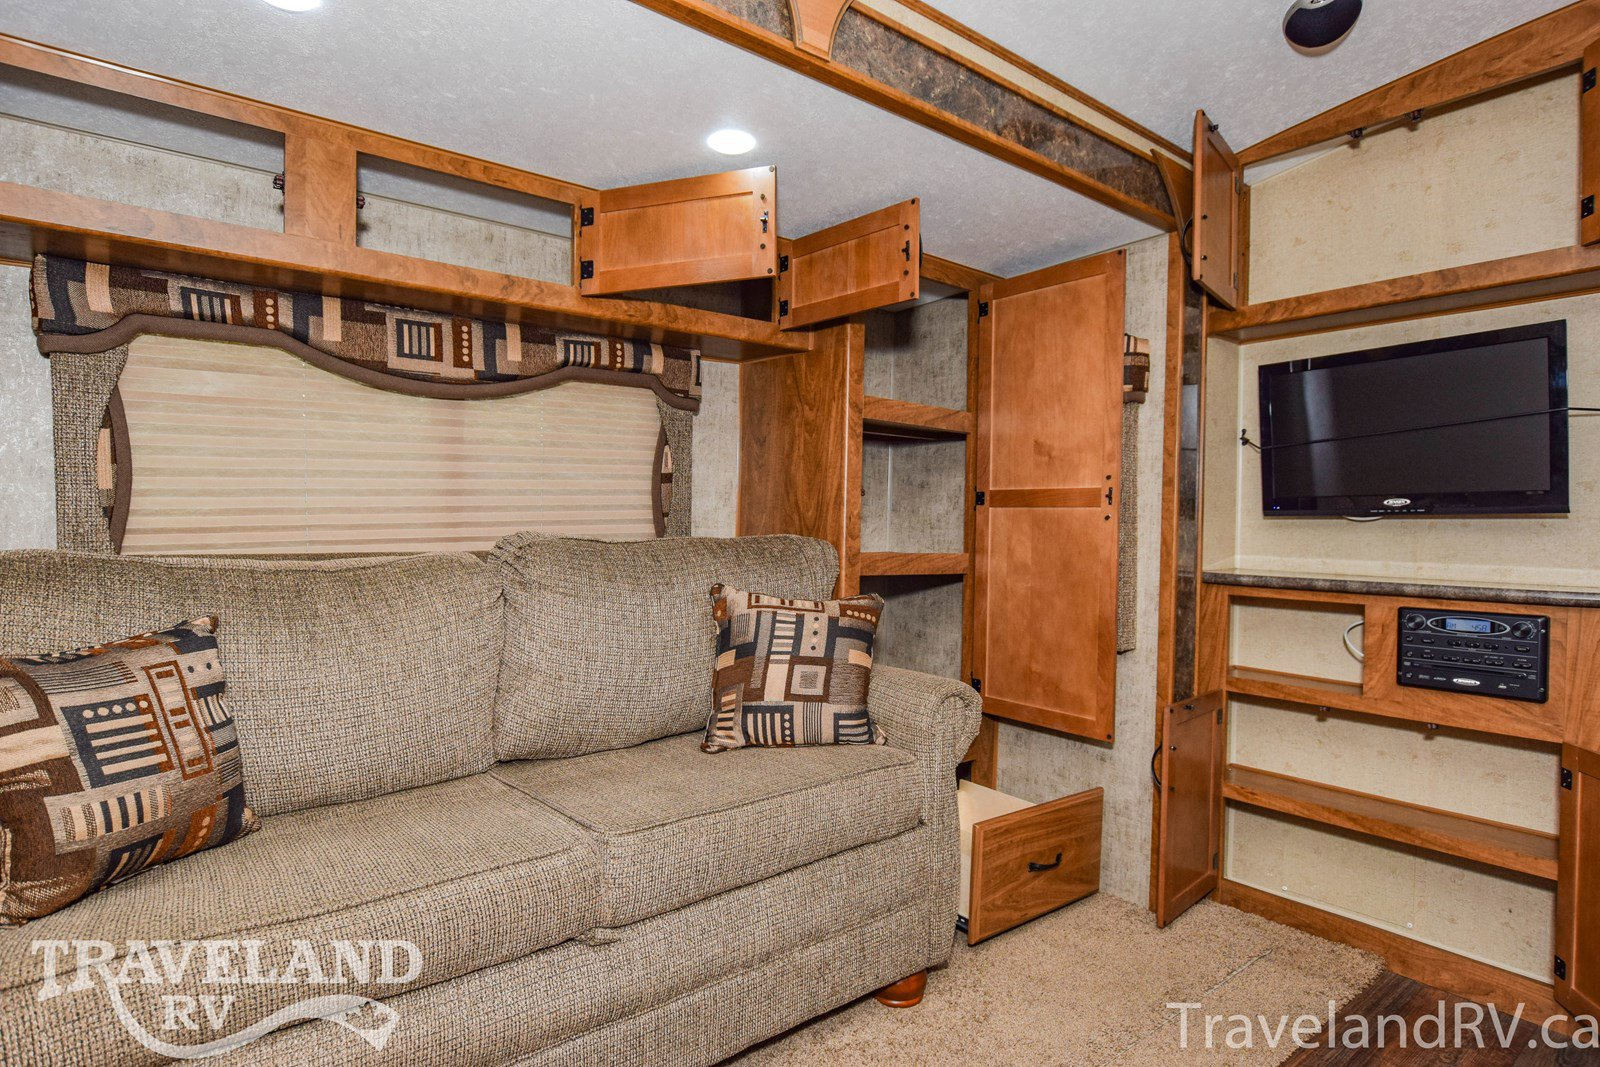 2014 Outdoors RV Timber Ridge 250RDS Thumbnail